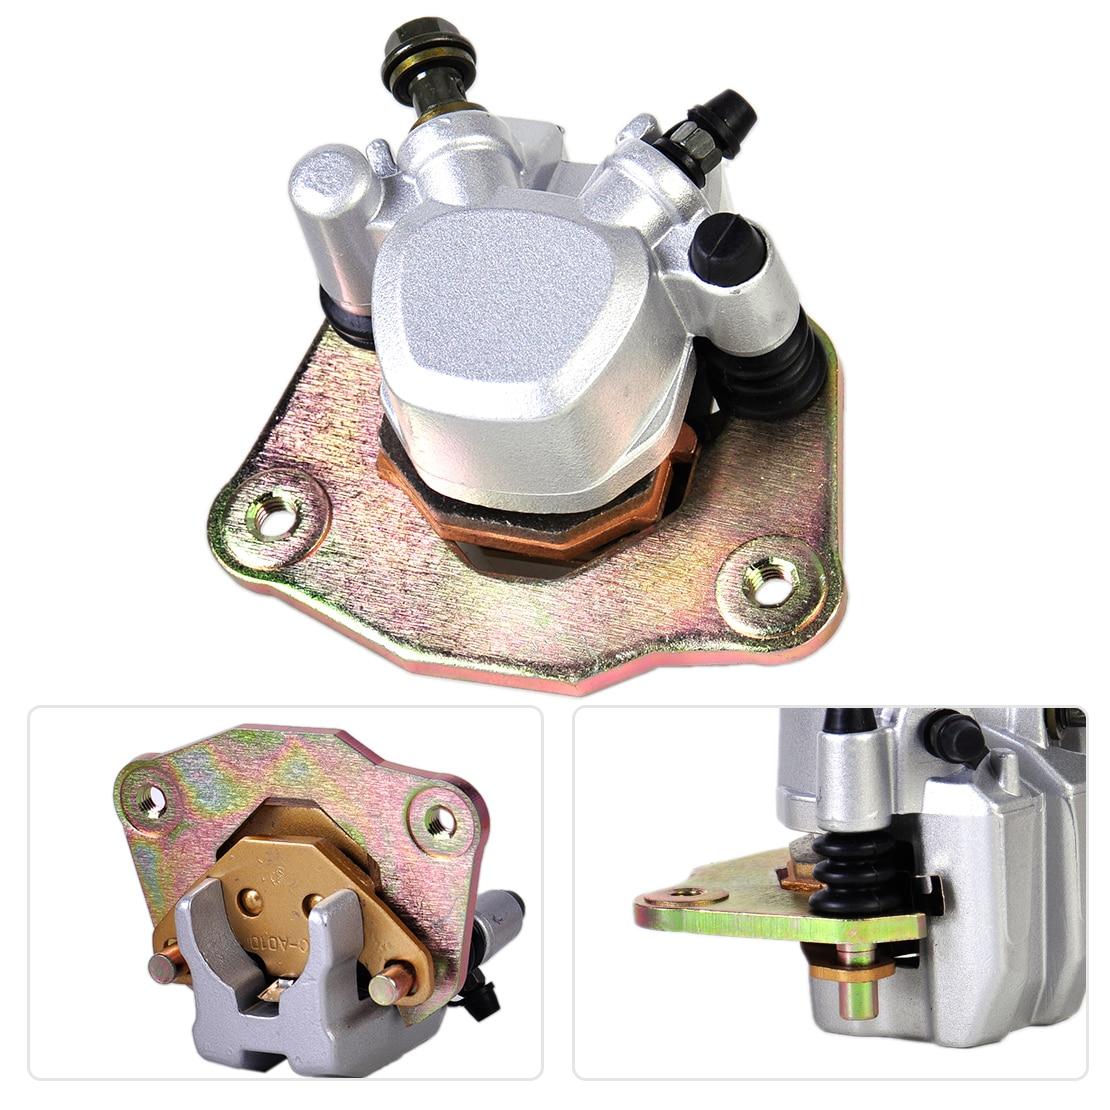 DWCX Rear Brake Caliper Replacement for Suzuki Vinson 500 LTA500F LTA500FB LTF500FC LTF500F LTF500FC bask vinson pro v2